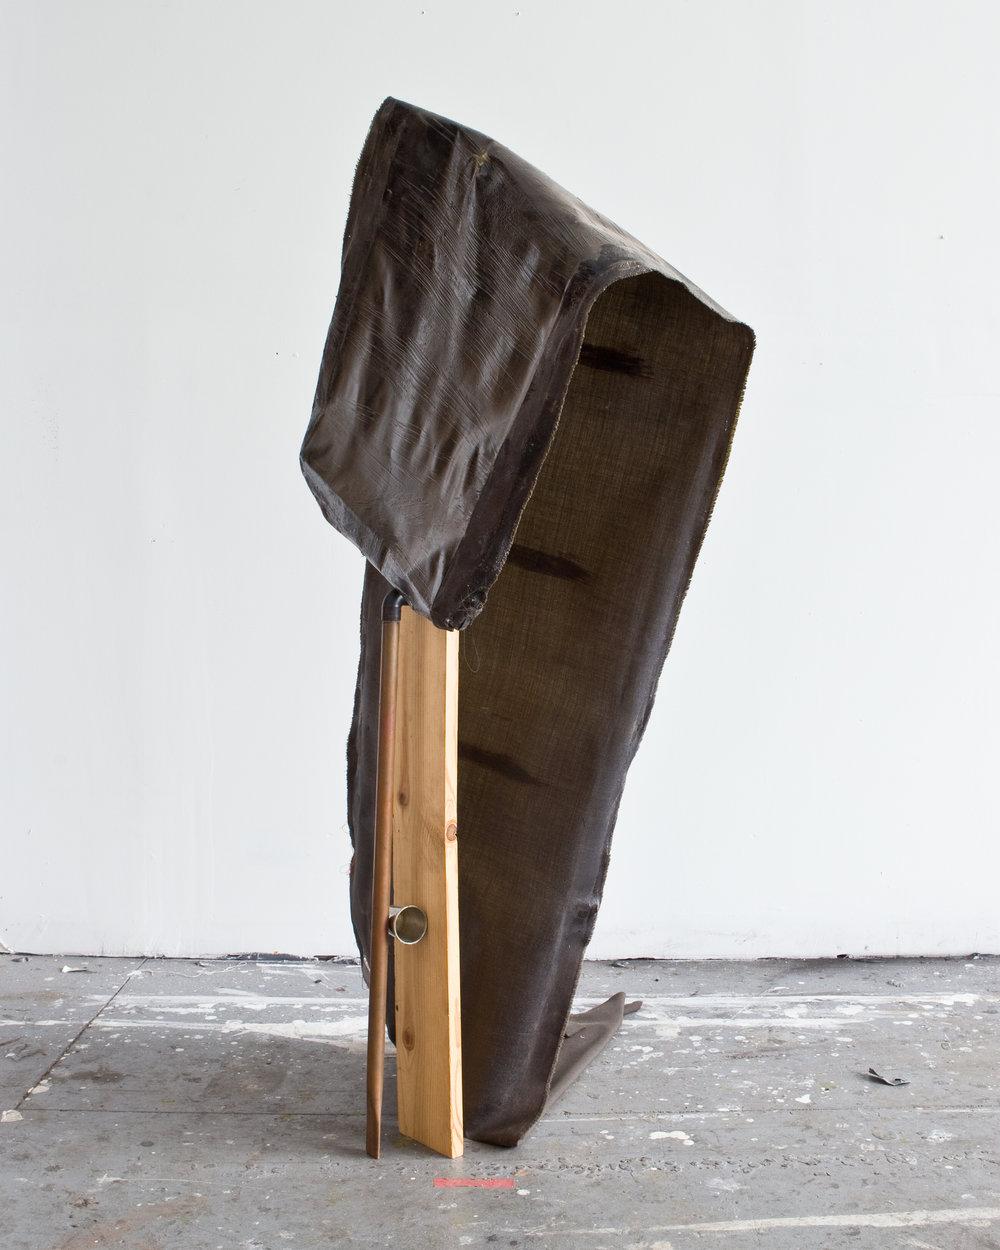 Regenerative Landscape | Fabric,polyurethane, copper, pewter, wood, wood stain, 2017